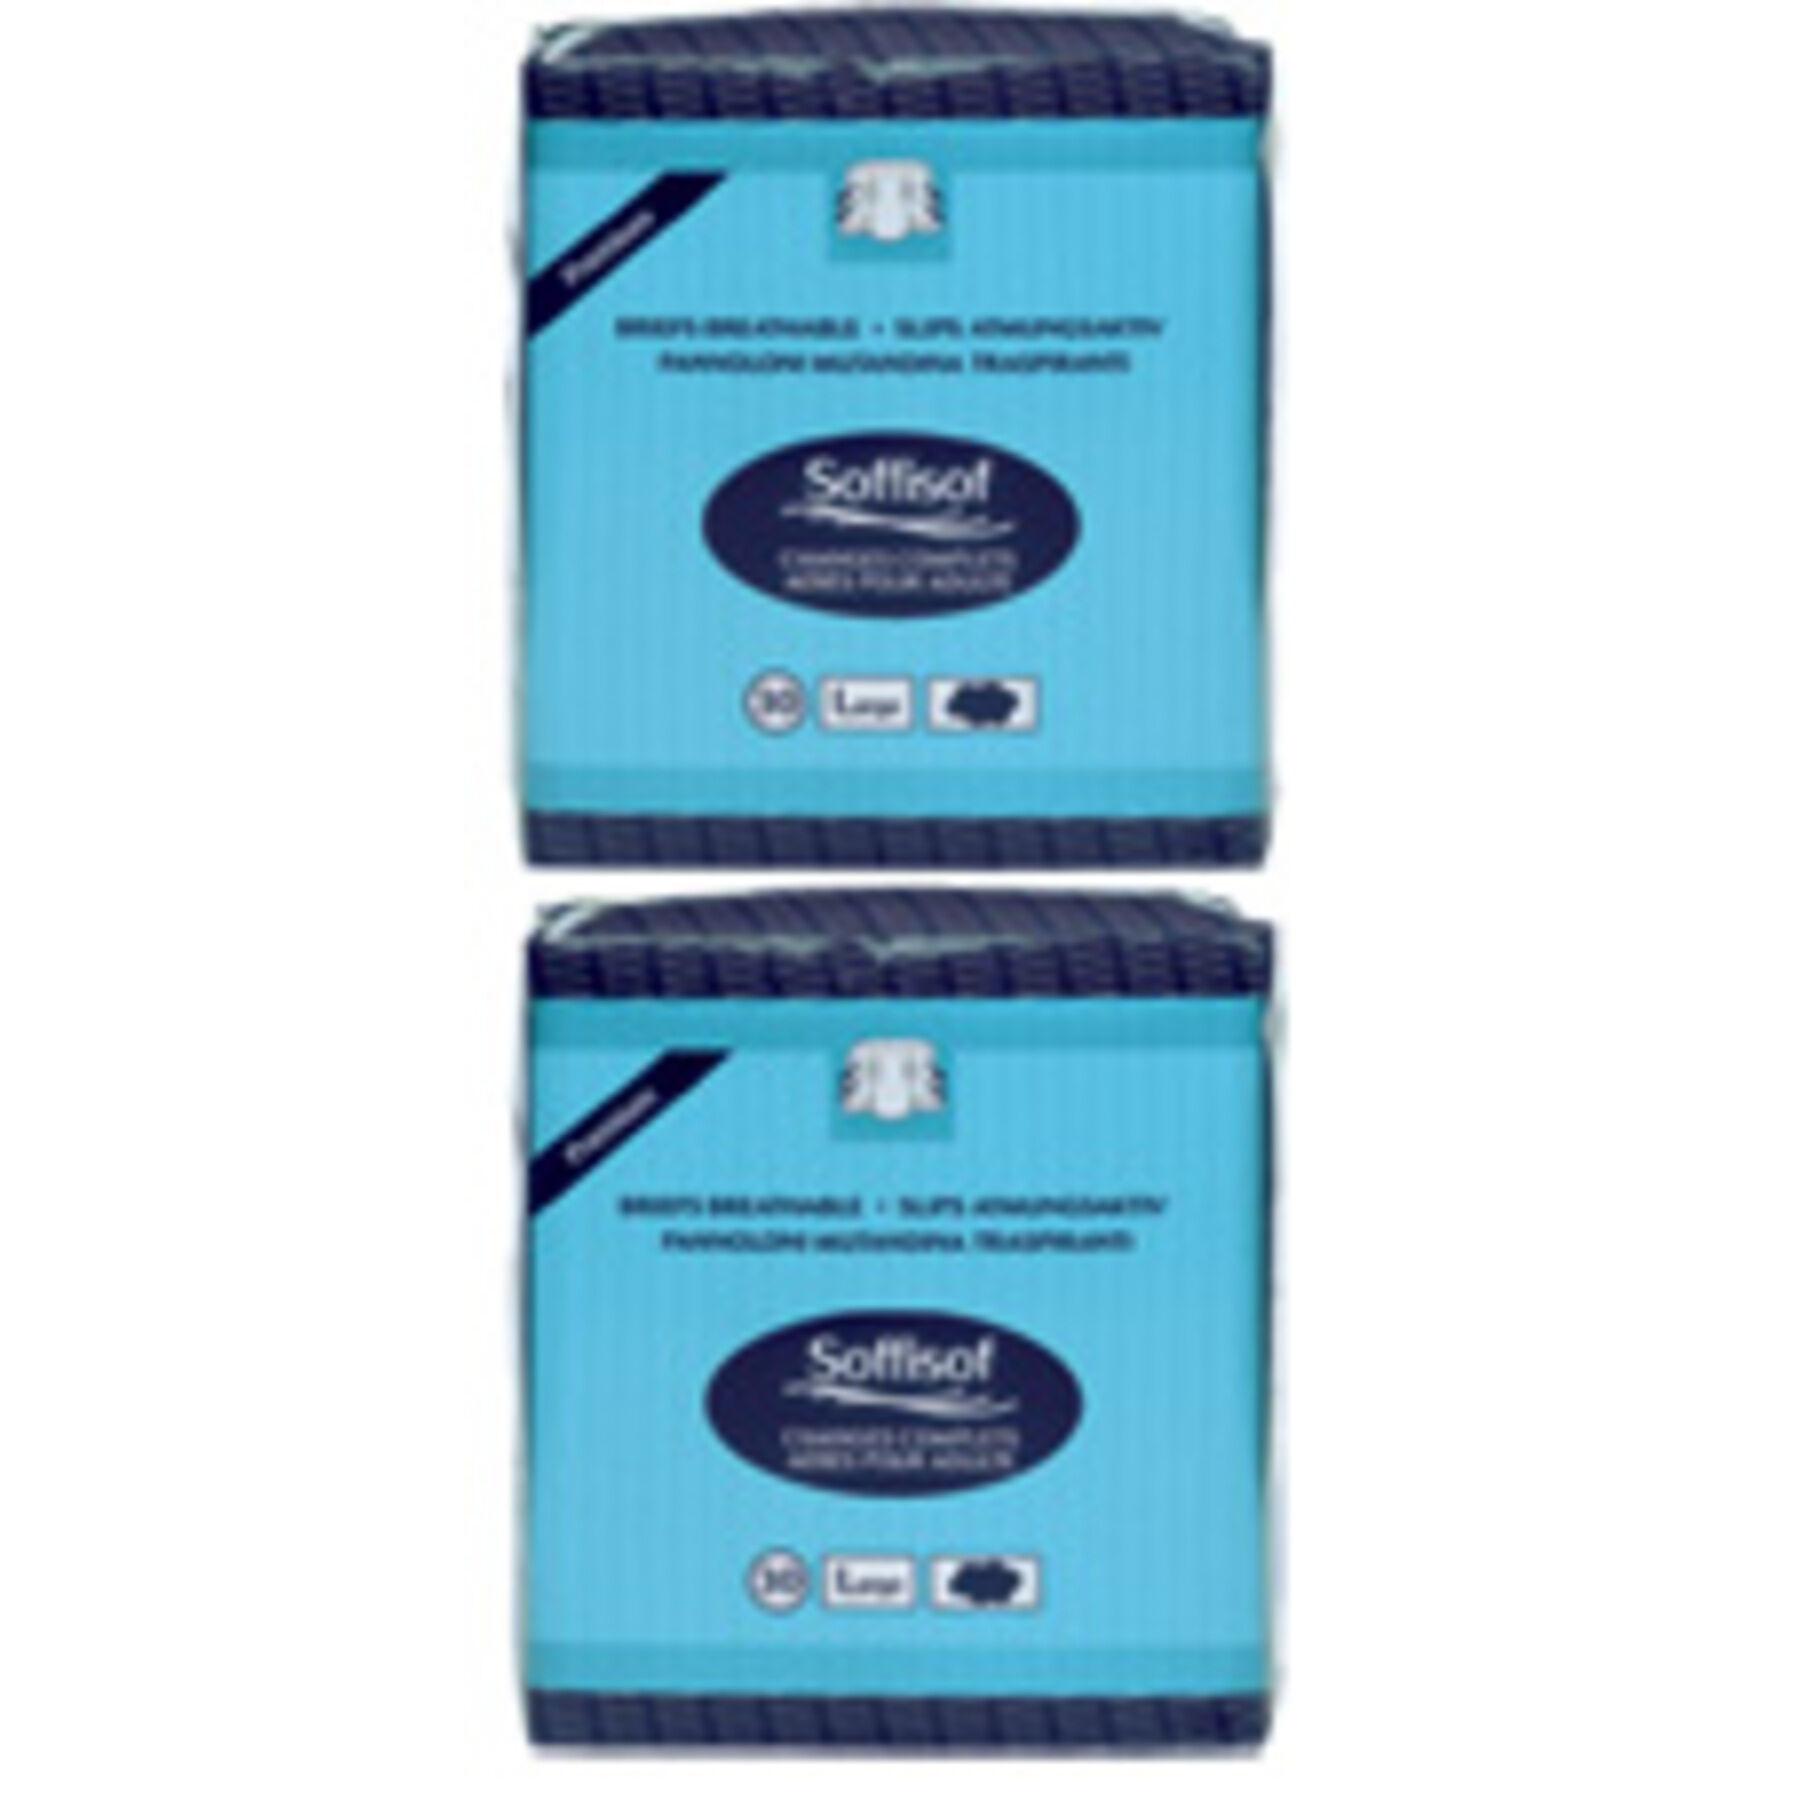 SILC SpA Pannolone per incontinenza a mutandina per adulto soffisof farm medium 30 pezzi